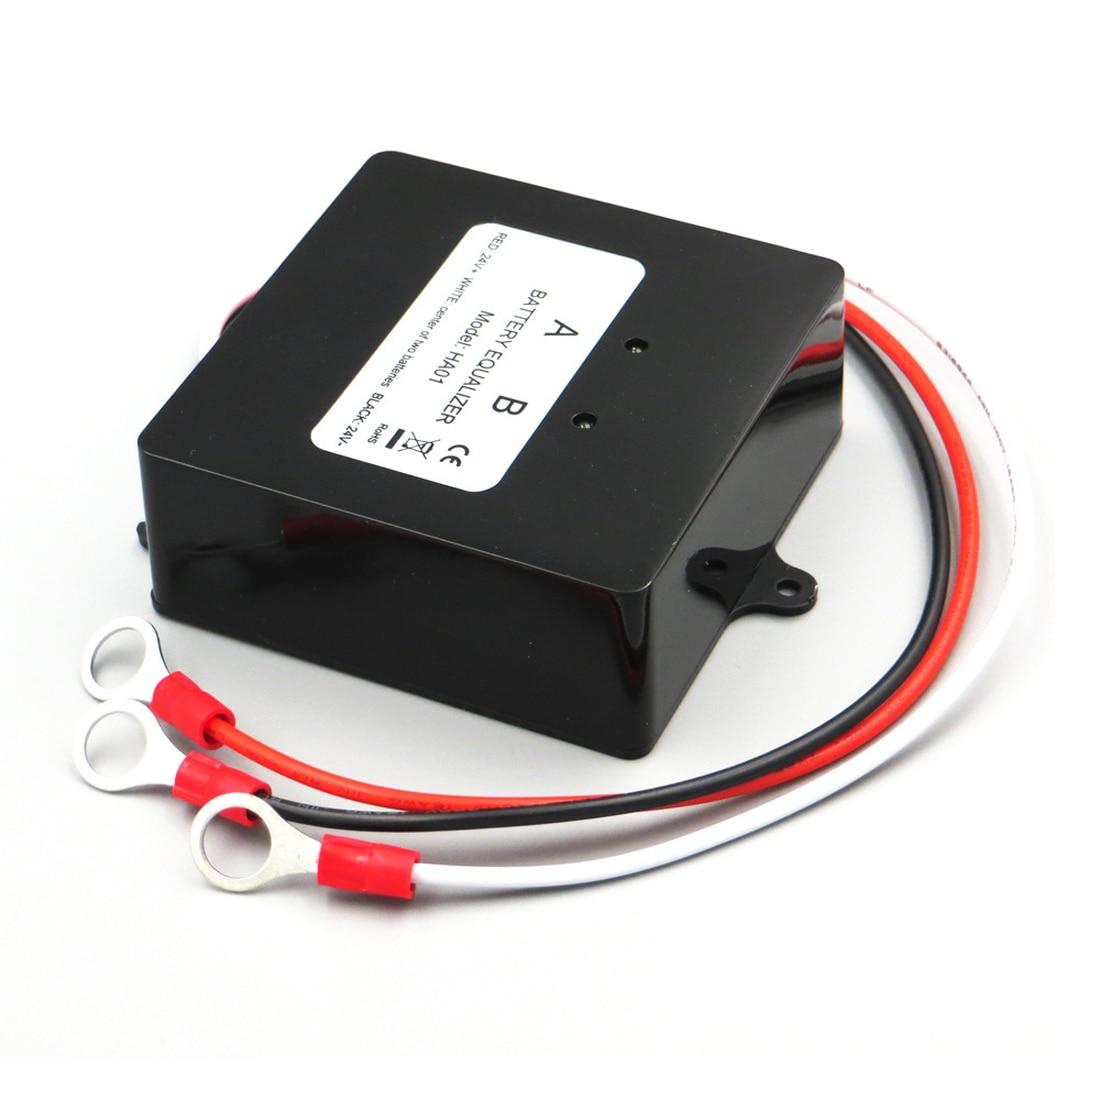 HA01-batterij Equalizer Speciaal Balansbalanstoestel 2X12V Balance 2 Batterijen Van Het Zonnesysteem